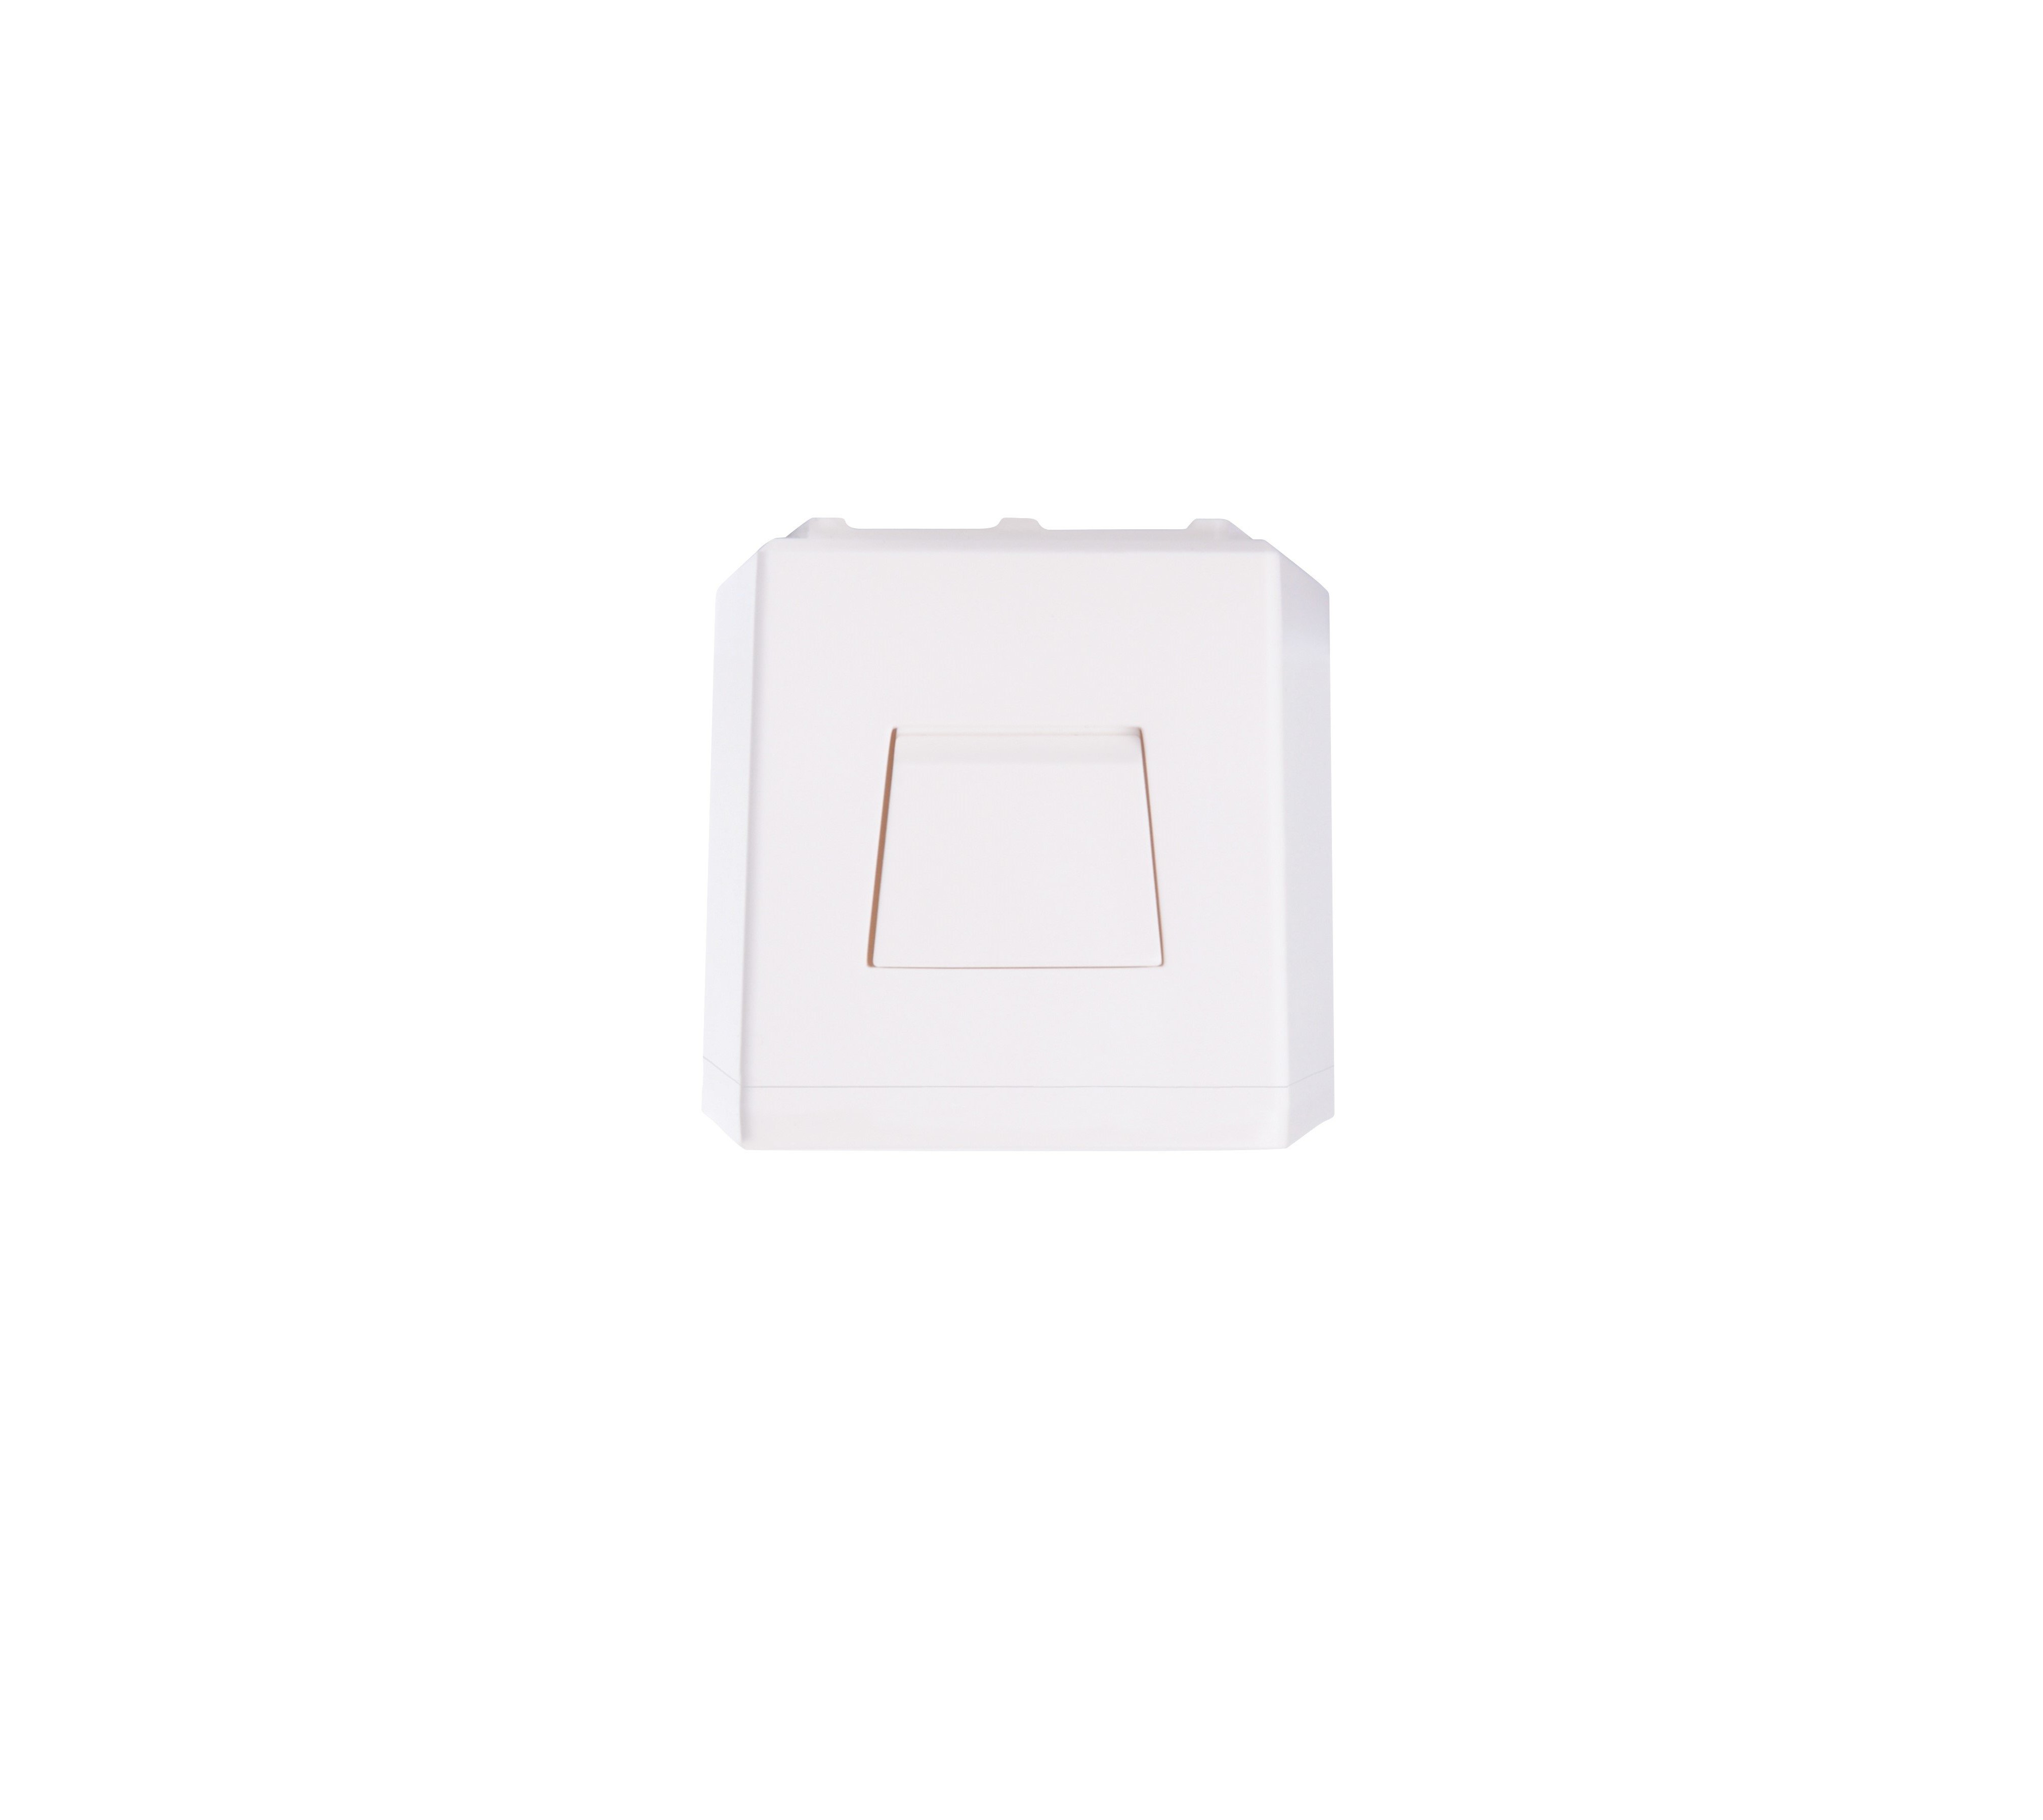 Lampa antipanica led Intelight 94756   3h mentinut test automat 1